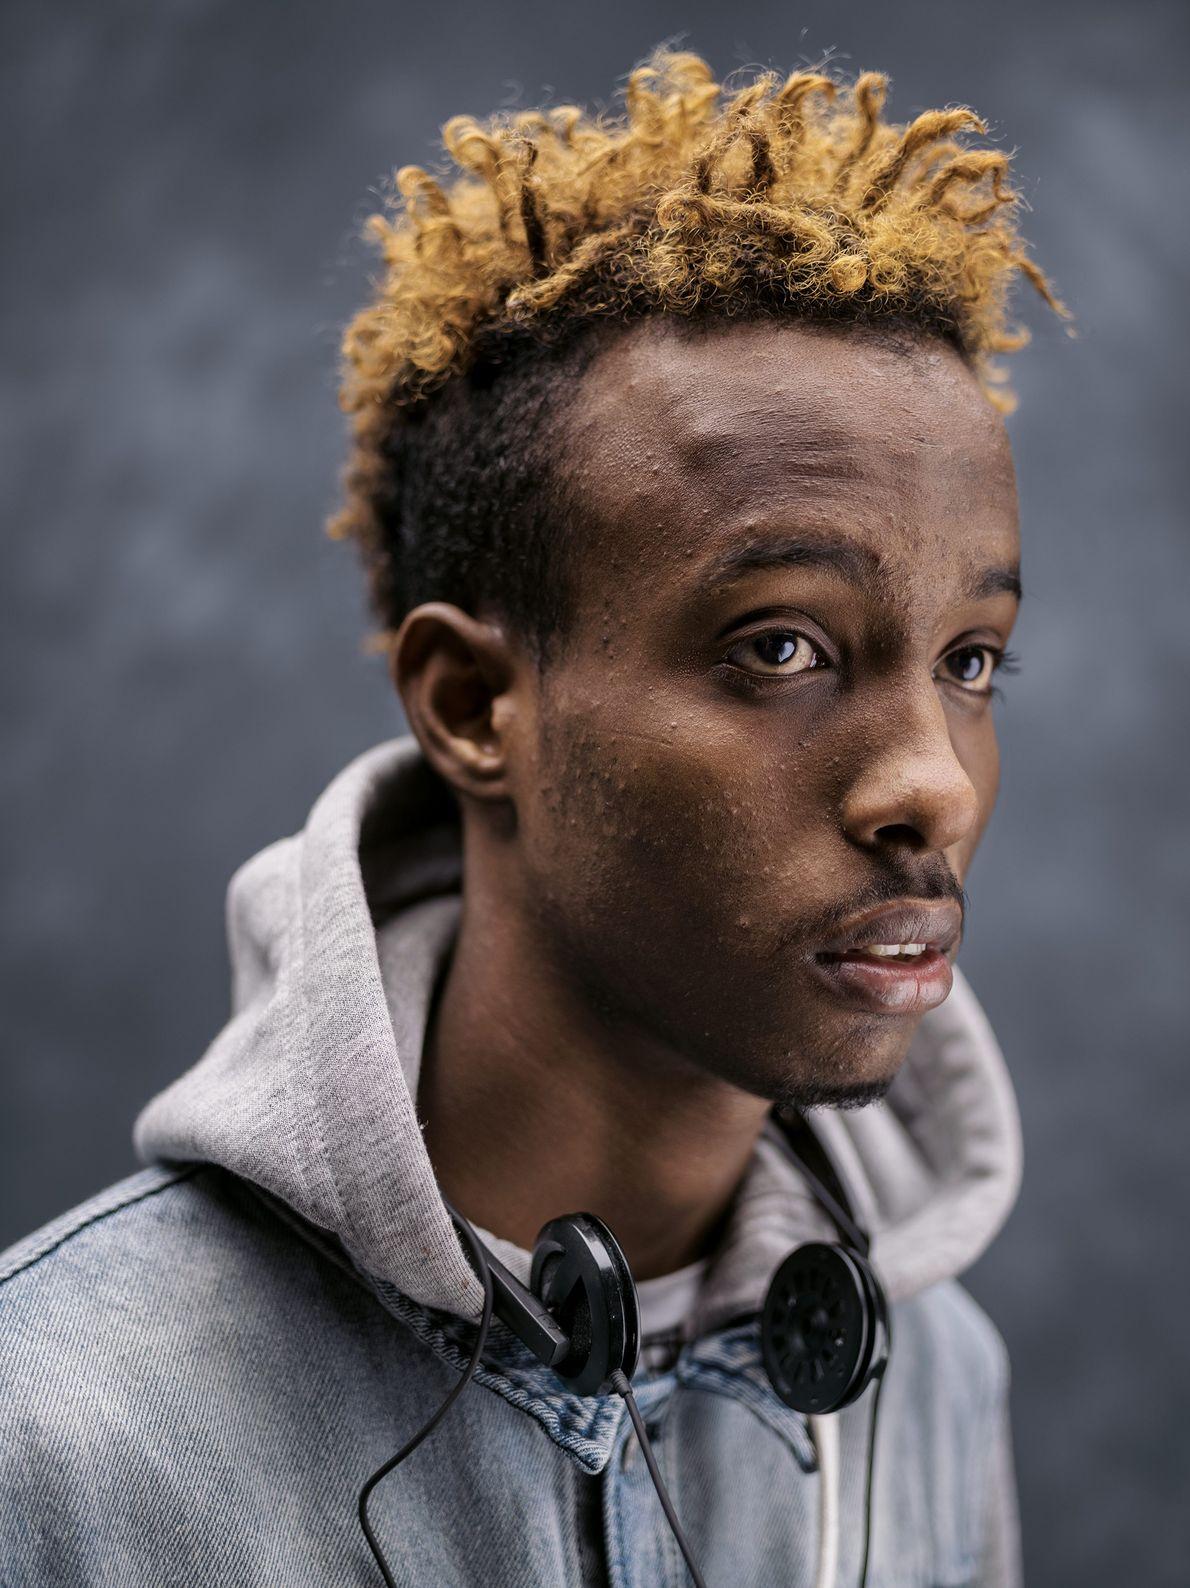 Somaliens en Suède